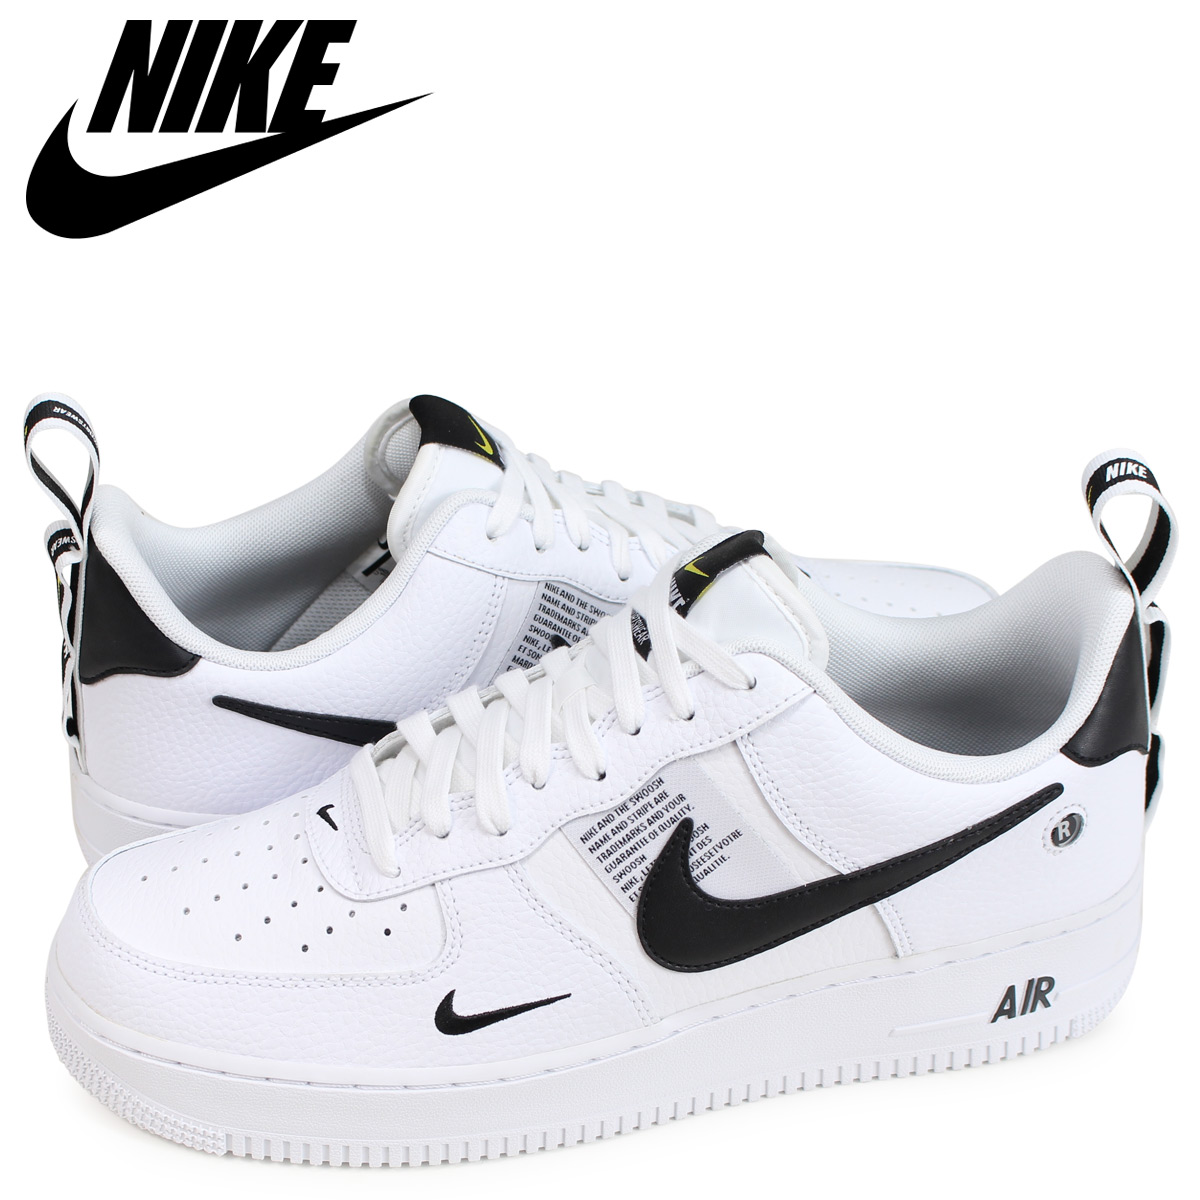 Nike Air Force 1' 07 Utility Sneakers In White AJ7747 100